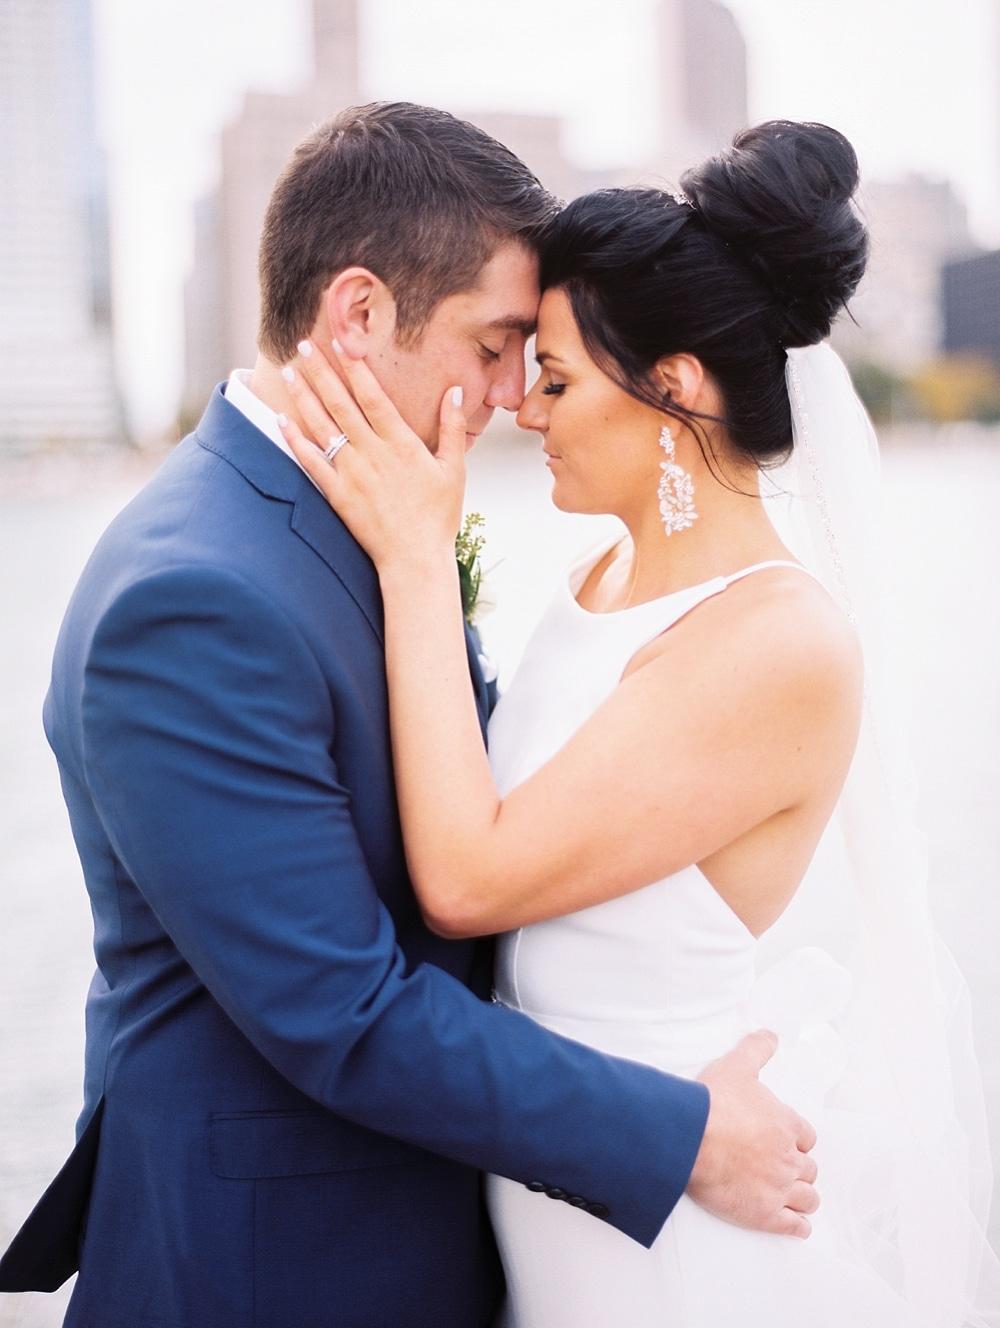 Kristin-La-Voie-Photography-chicago-wedding-photographer-79